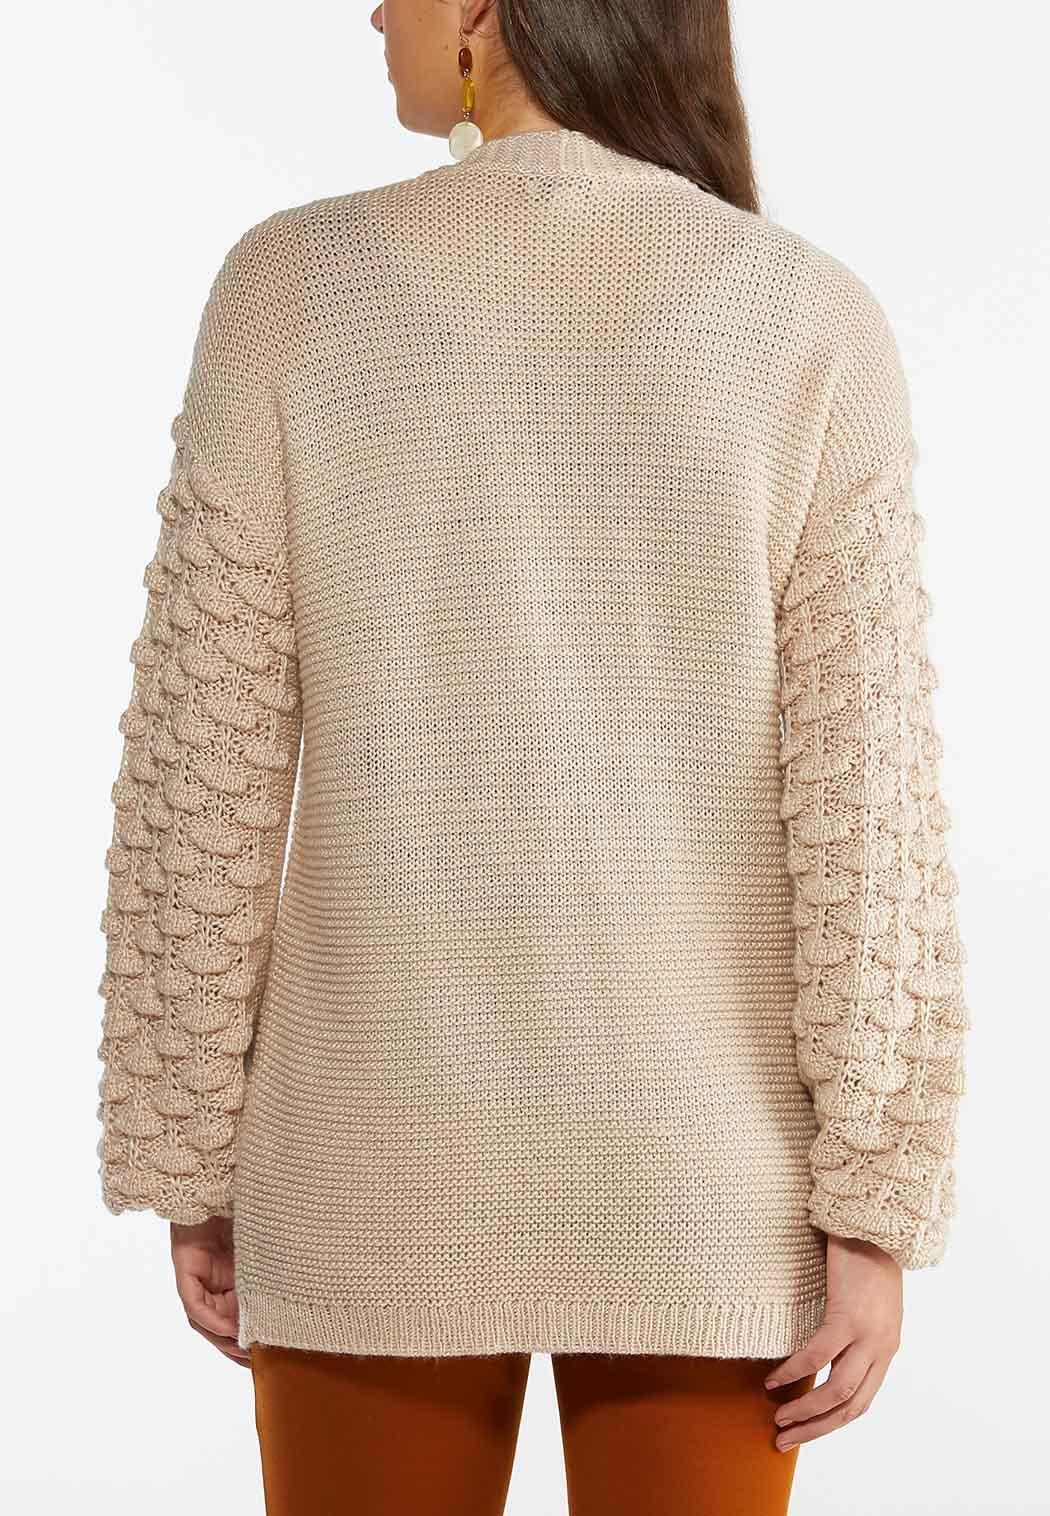 Balloon Sleeve Cardigan Sweater (Item #44356996)